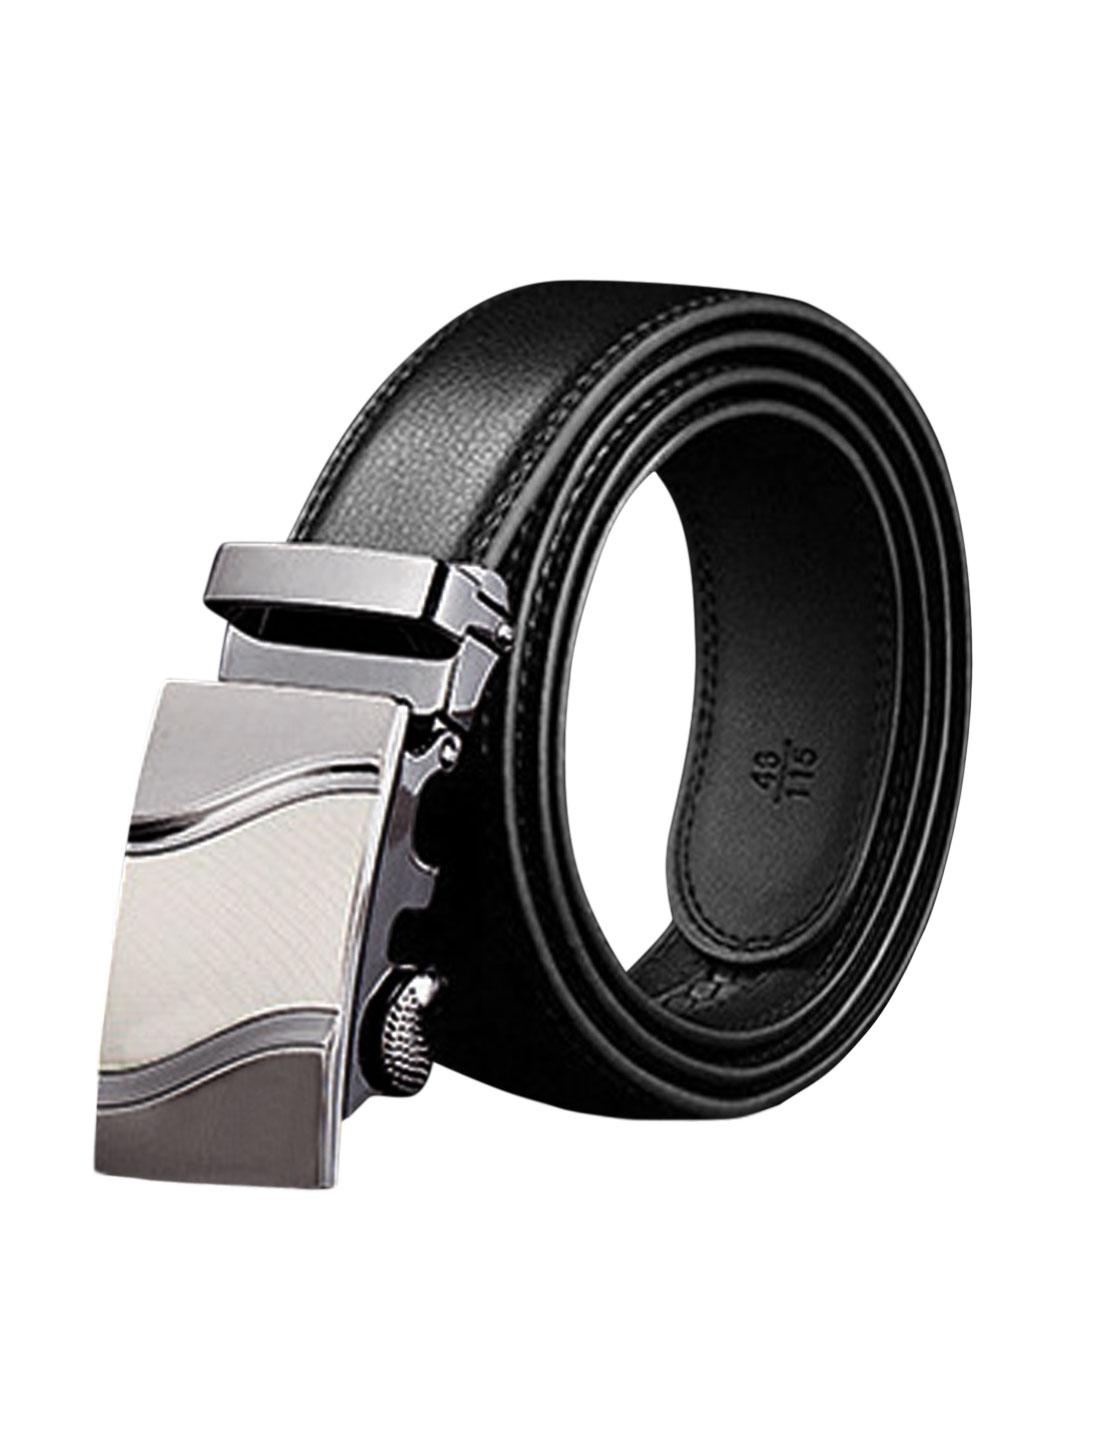 Man Automatic Buckle Holeless Adjustable PU Belt Black 110CM